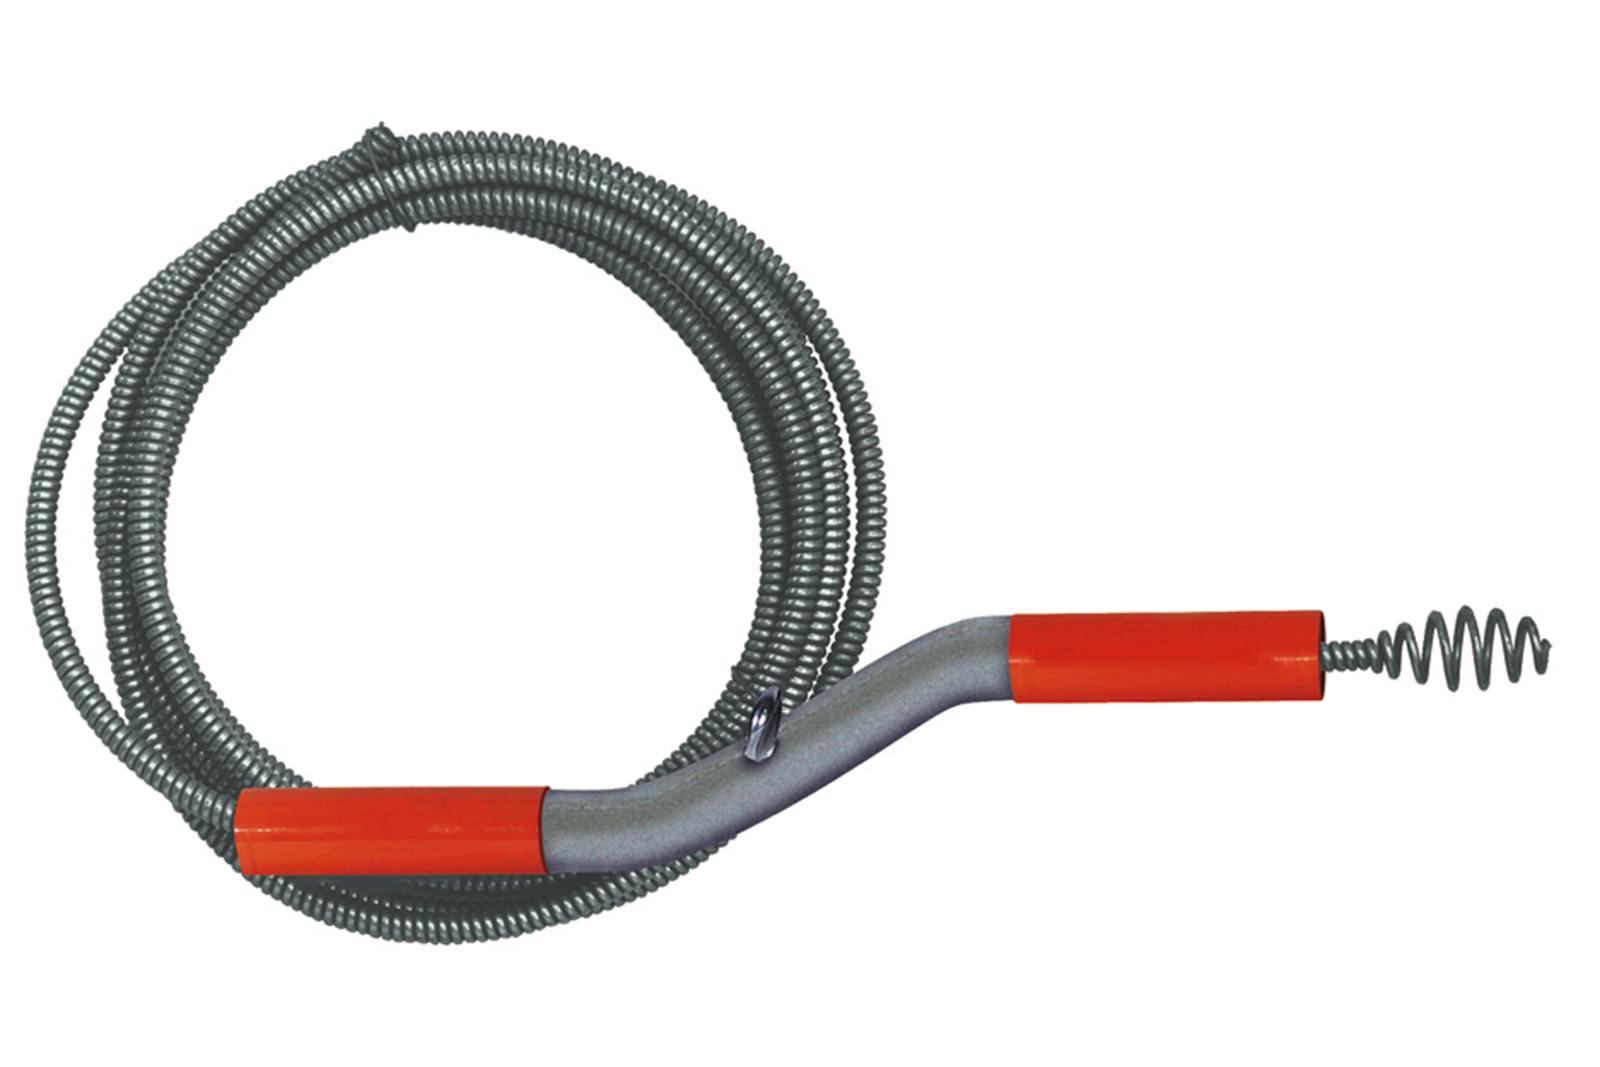 Трос для прочистки General pipe 25fl1-a-dh